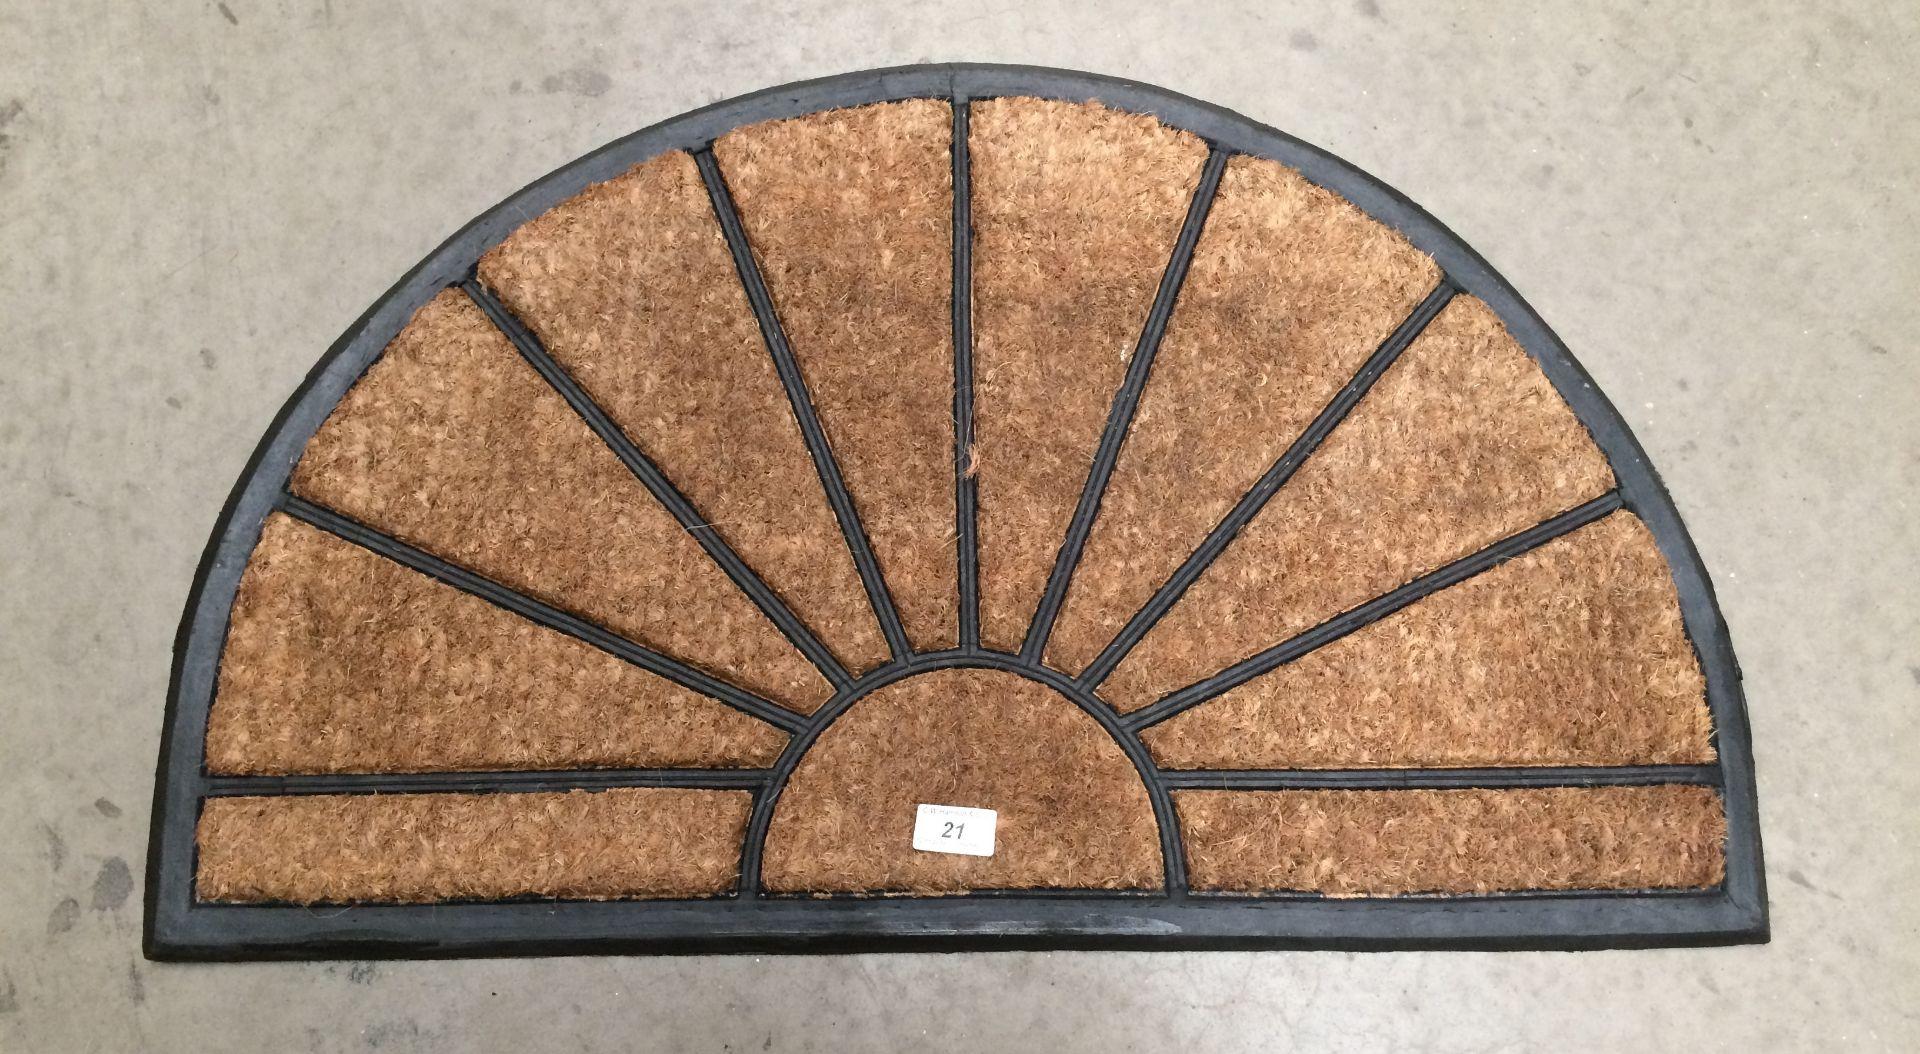 Lot 21 - 5 x Sunburst door mats each 45 x 75cm